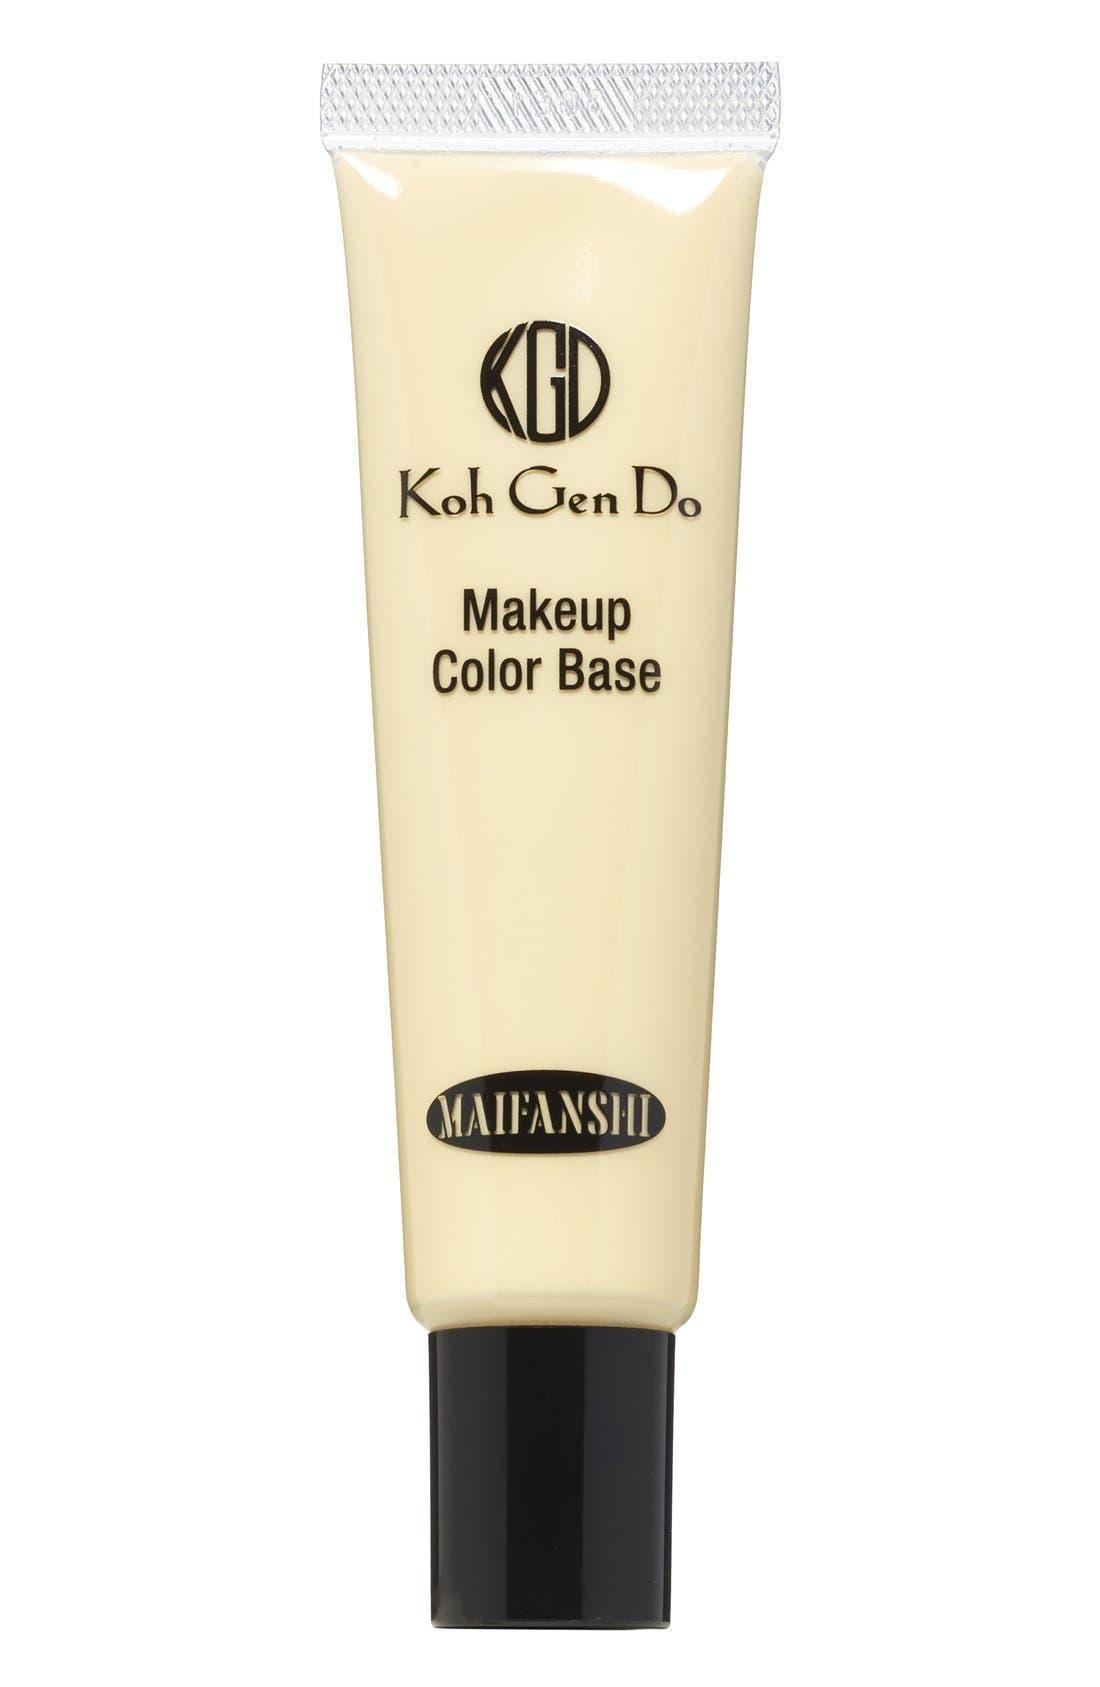 Koh Gen Do 'Maifanshi - Yellow' Makeup Color Base